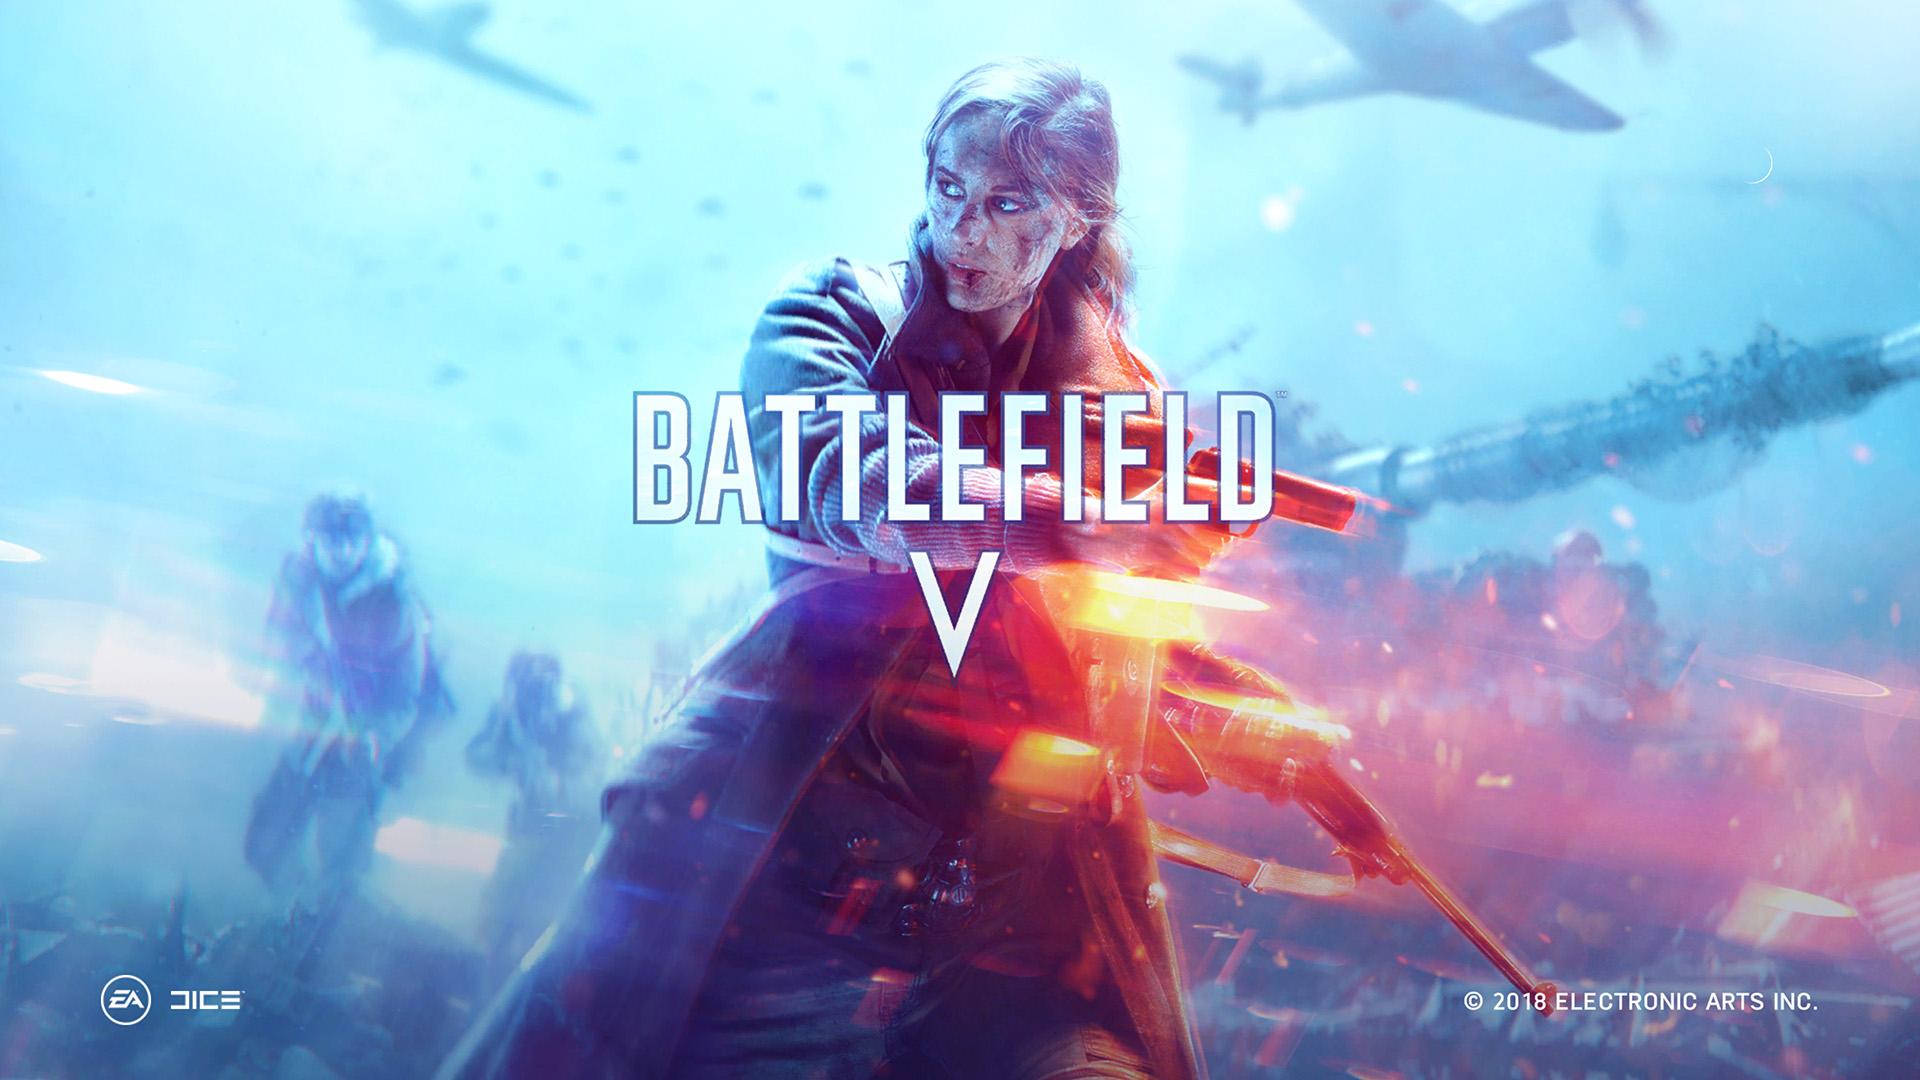 Battlefield V Screenshot 2018_0046_Layer 0.jpg